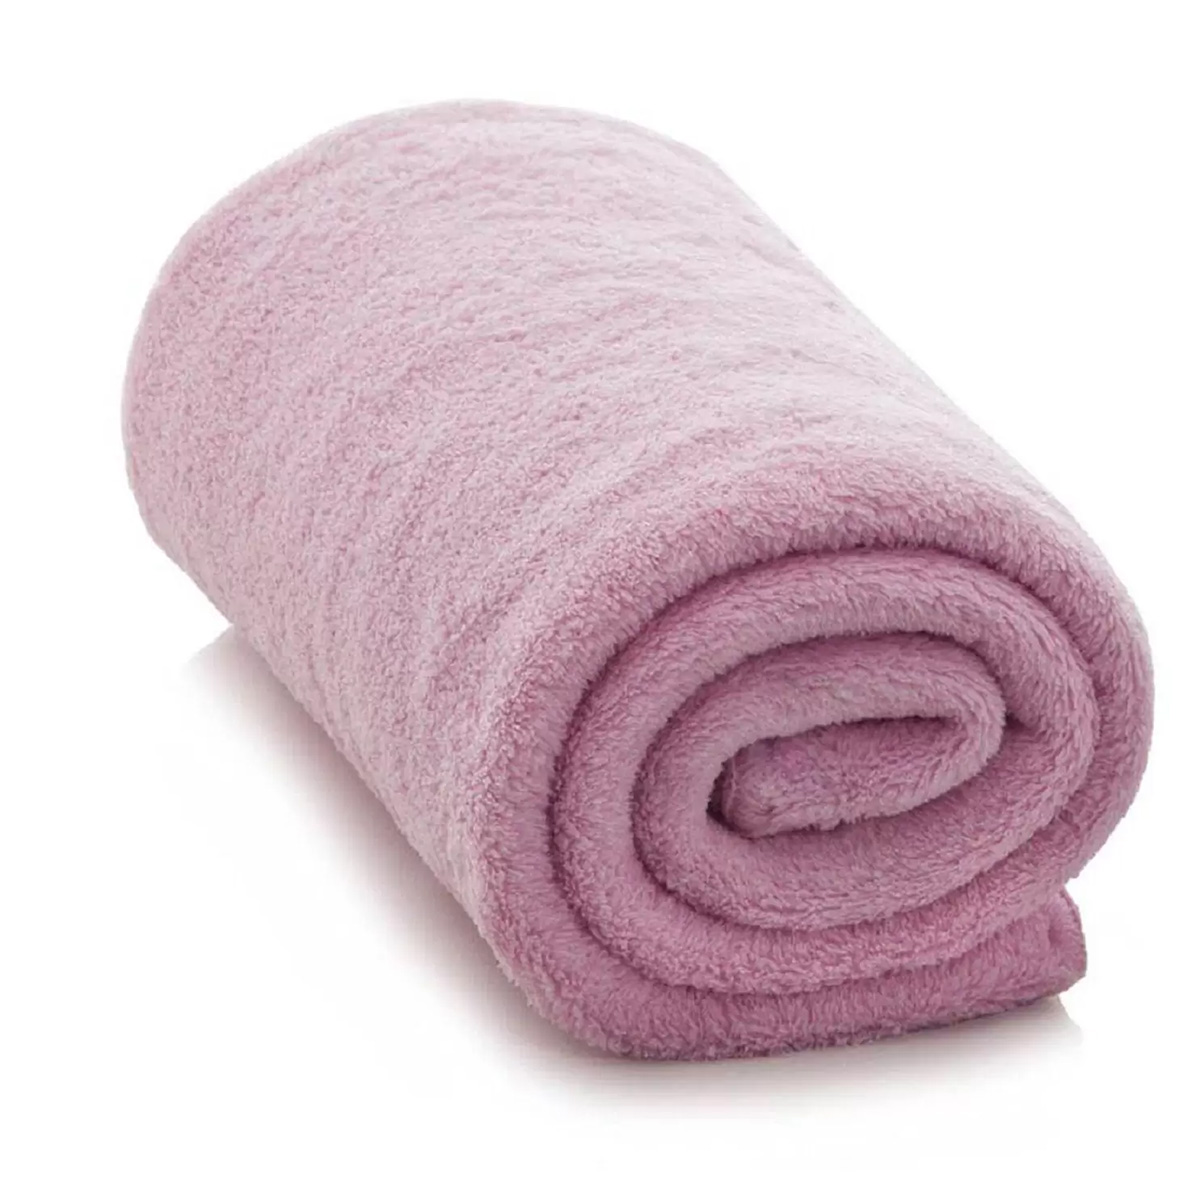 Cobertor Camesa Baby Microfibra Rosa